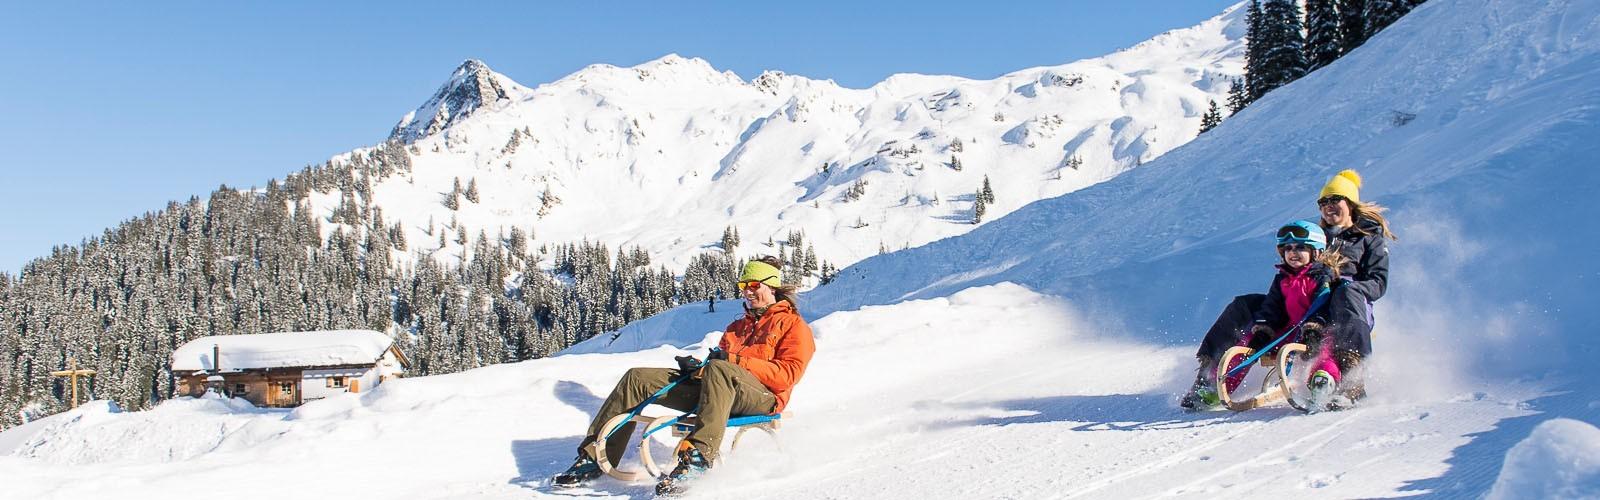 Sport Milanovic - Schlitten fahren am Arlberg